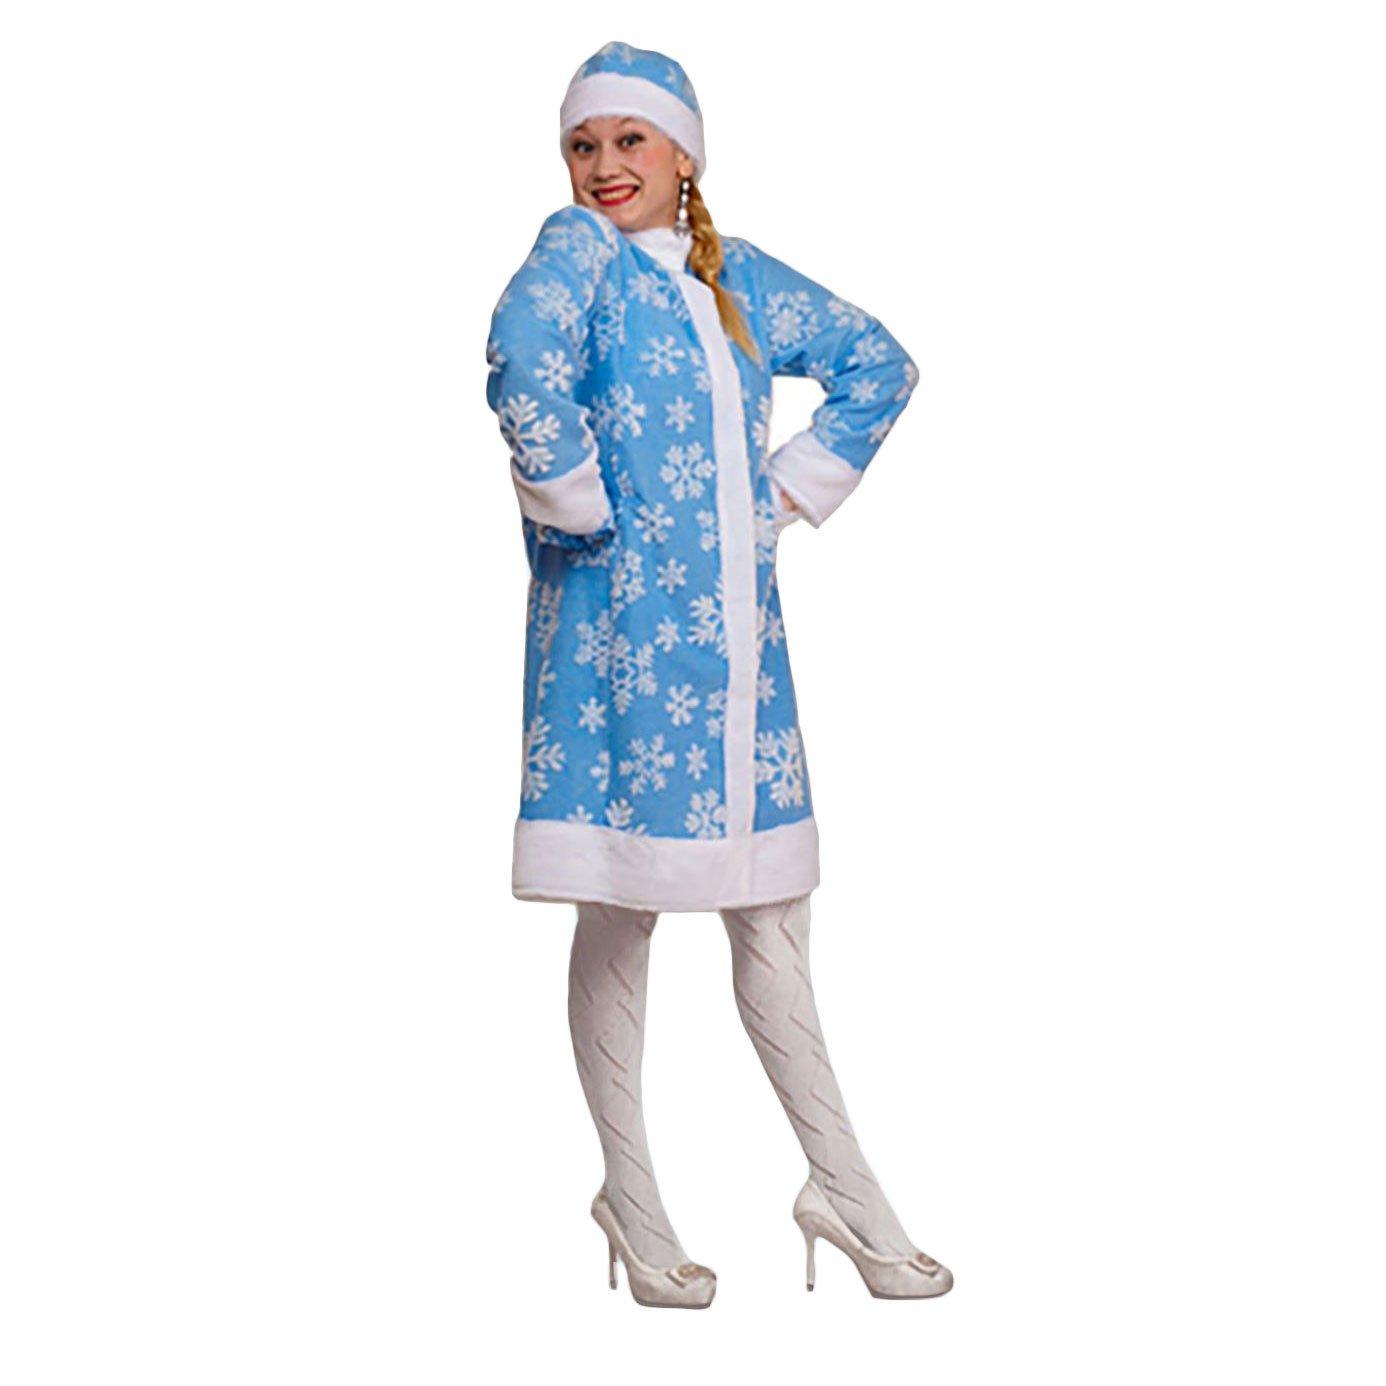 Russouvenir Kostüm 'Snegurotschka' (Schneemädchen) blau, Größe L